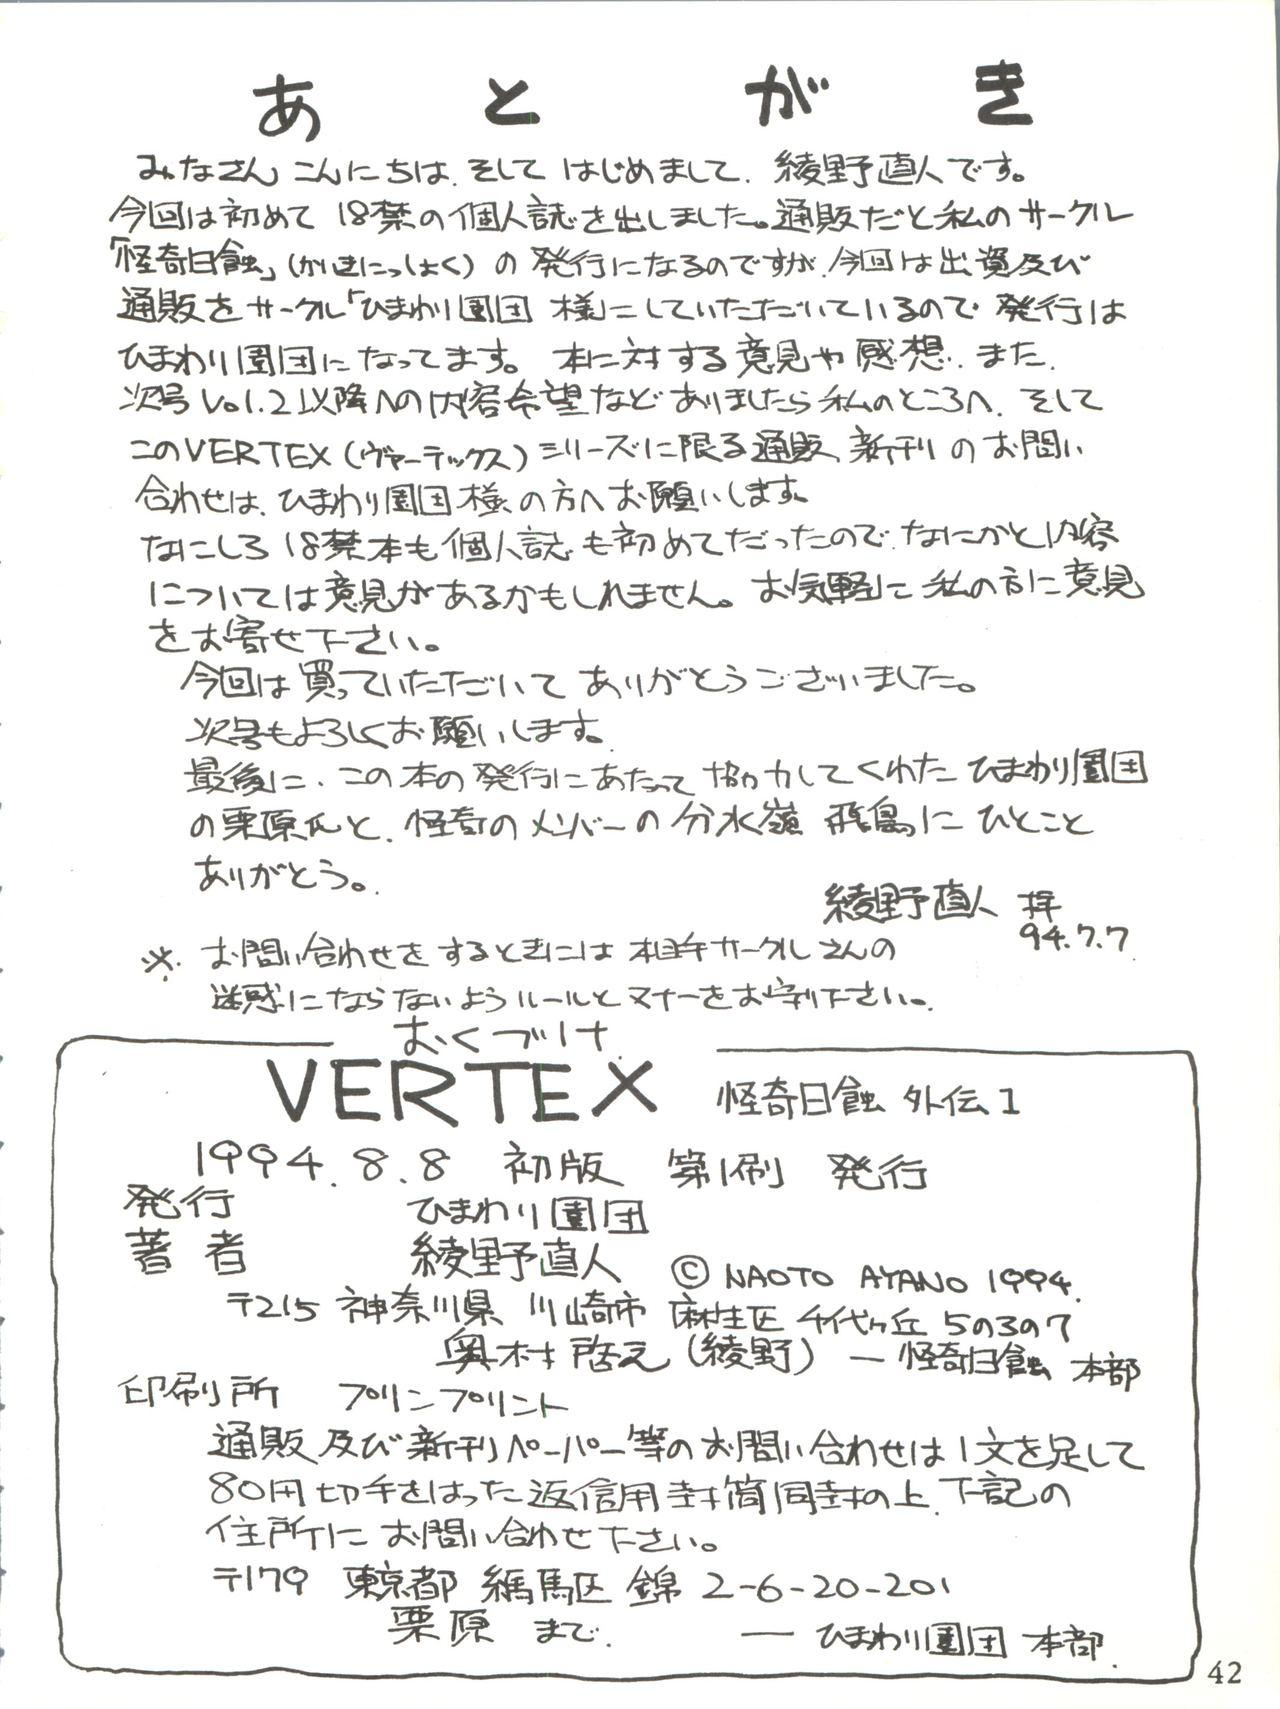 VERTEX 41